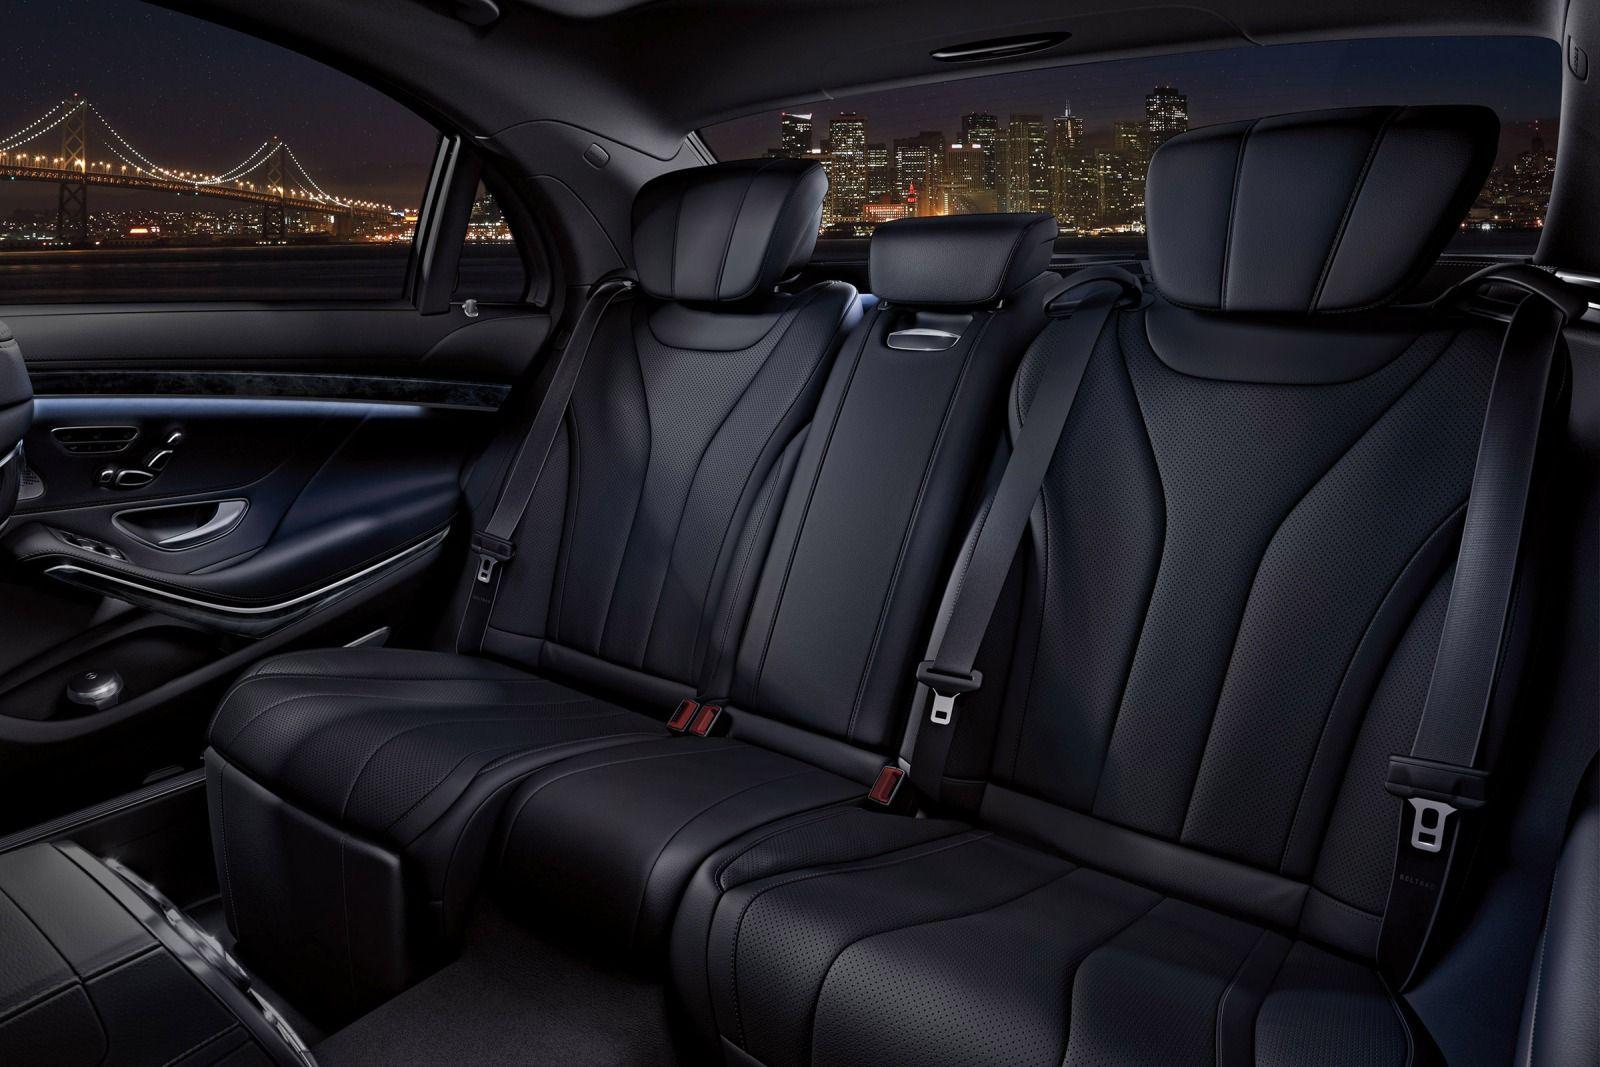 Mercedes-_Benz_s550_Interior_02